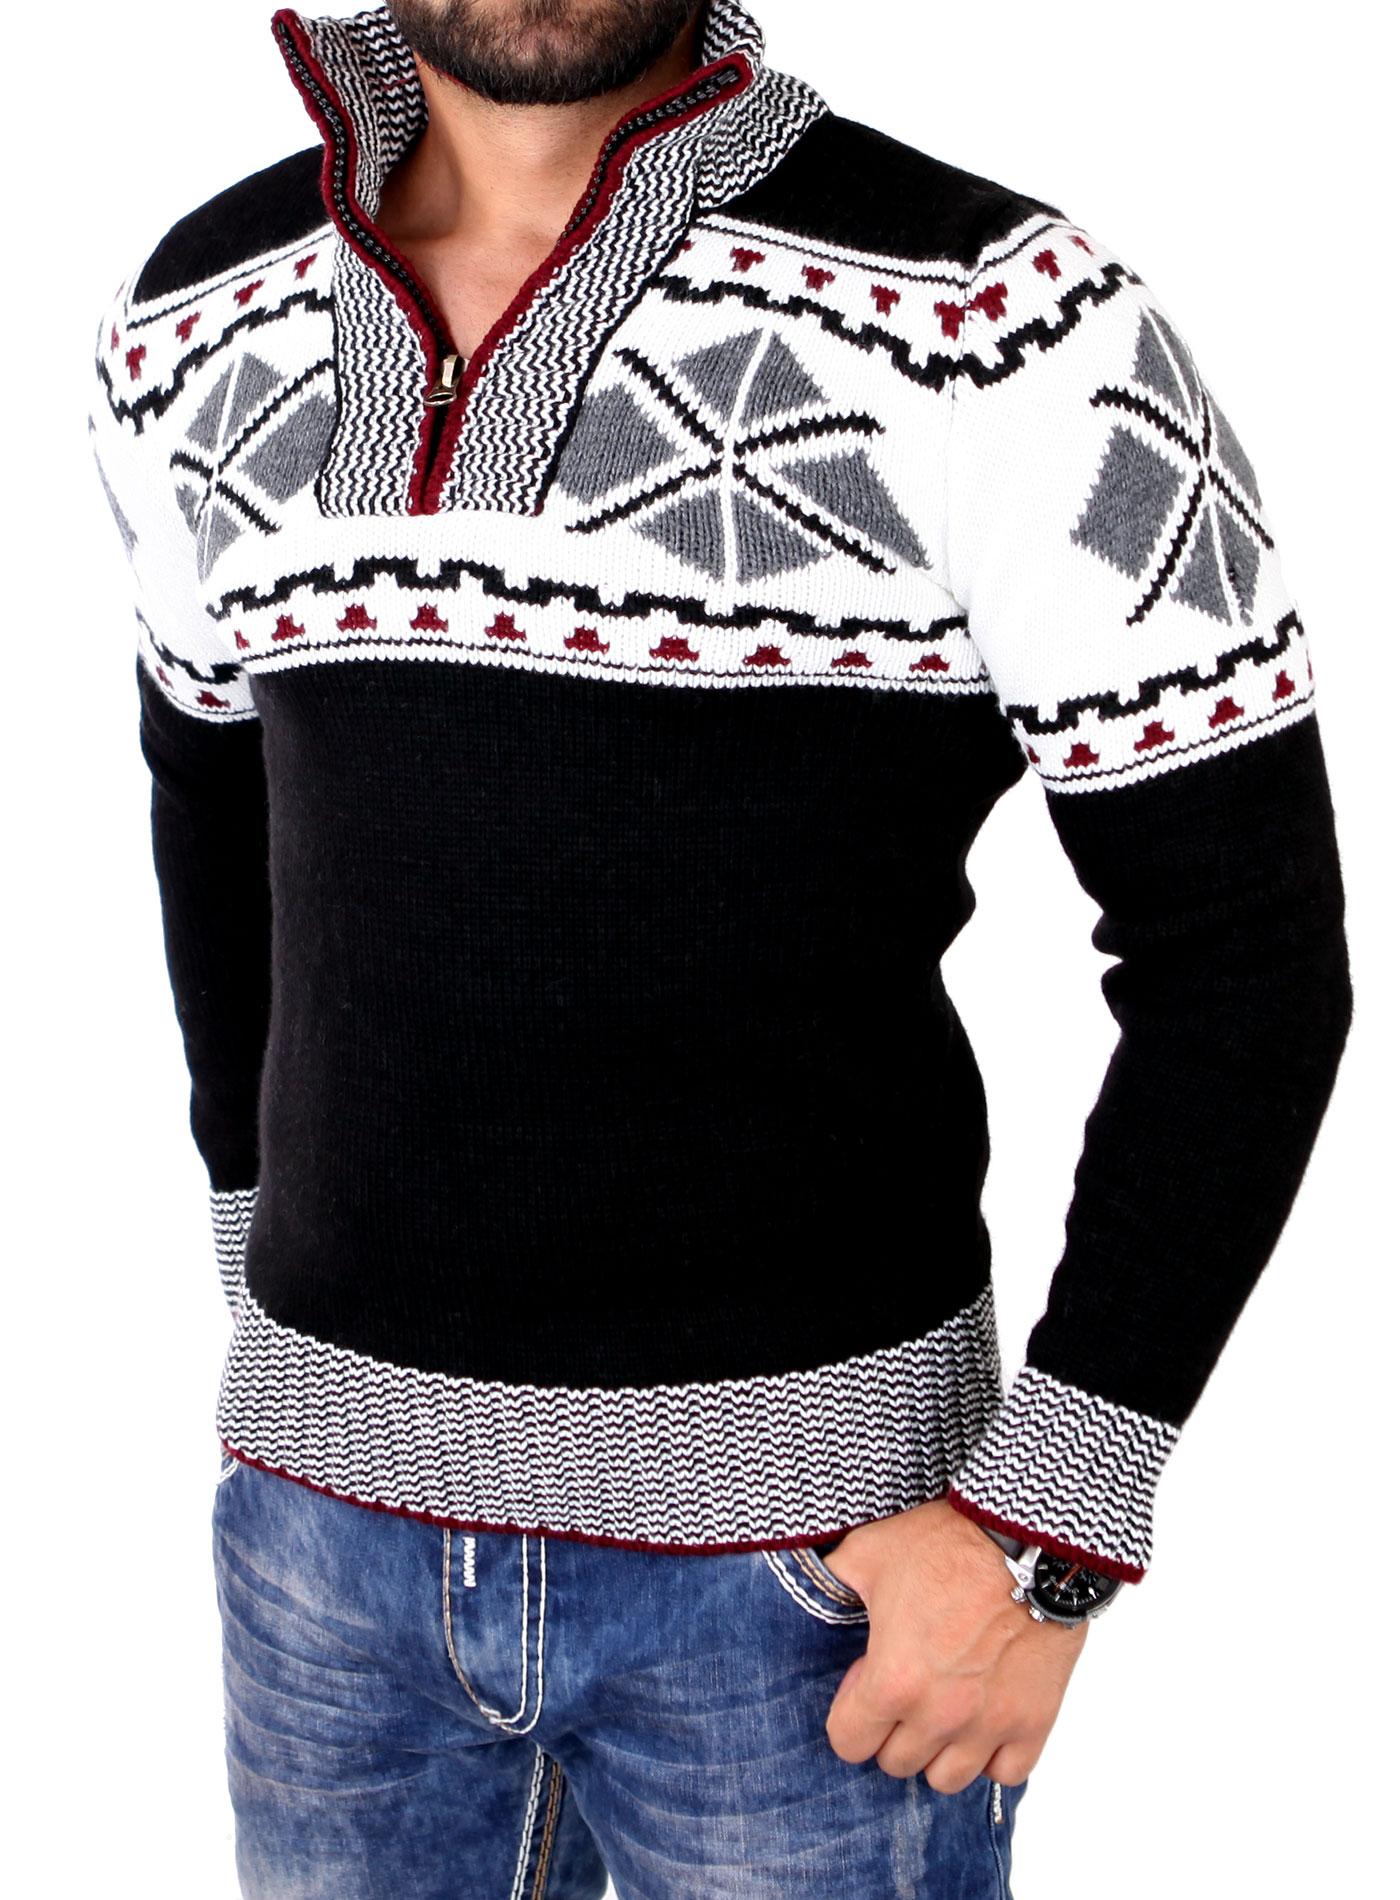 tazzio casual strick pullover herren stehkragen norweger. Black Bedroom Furniture Sets. Home Design Ideas